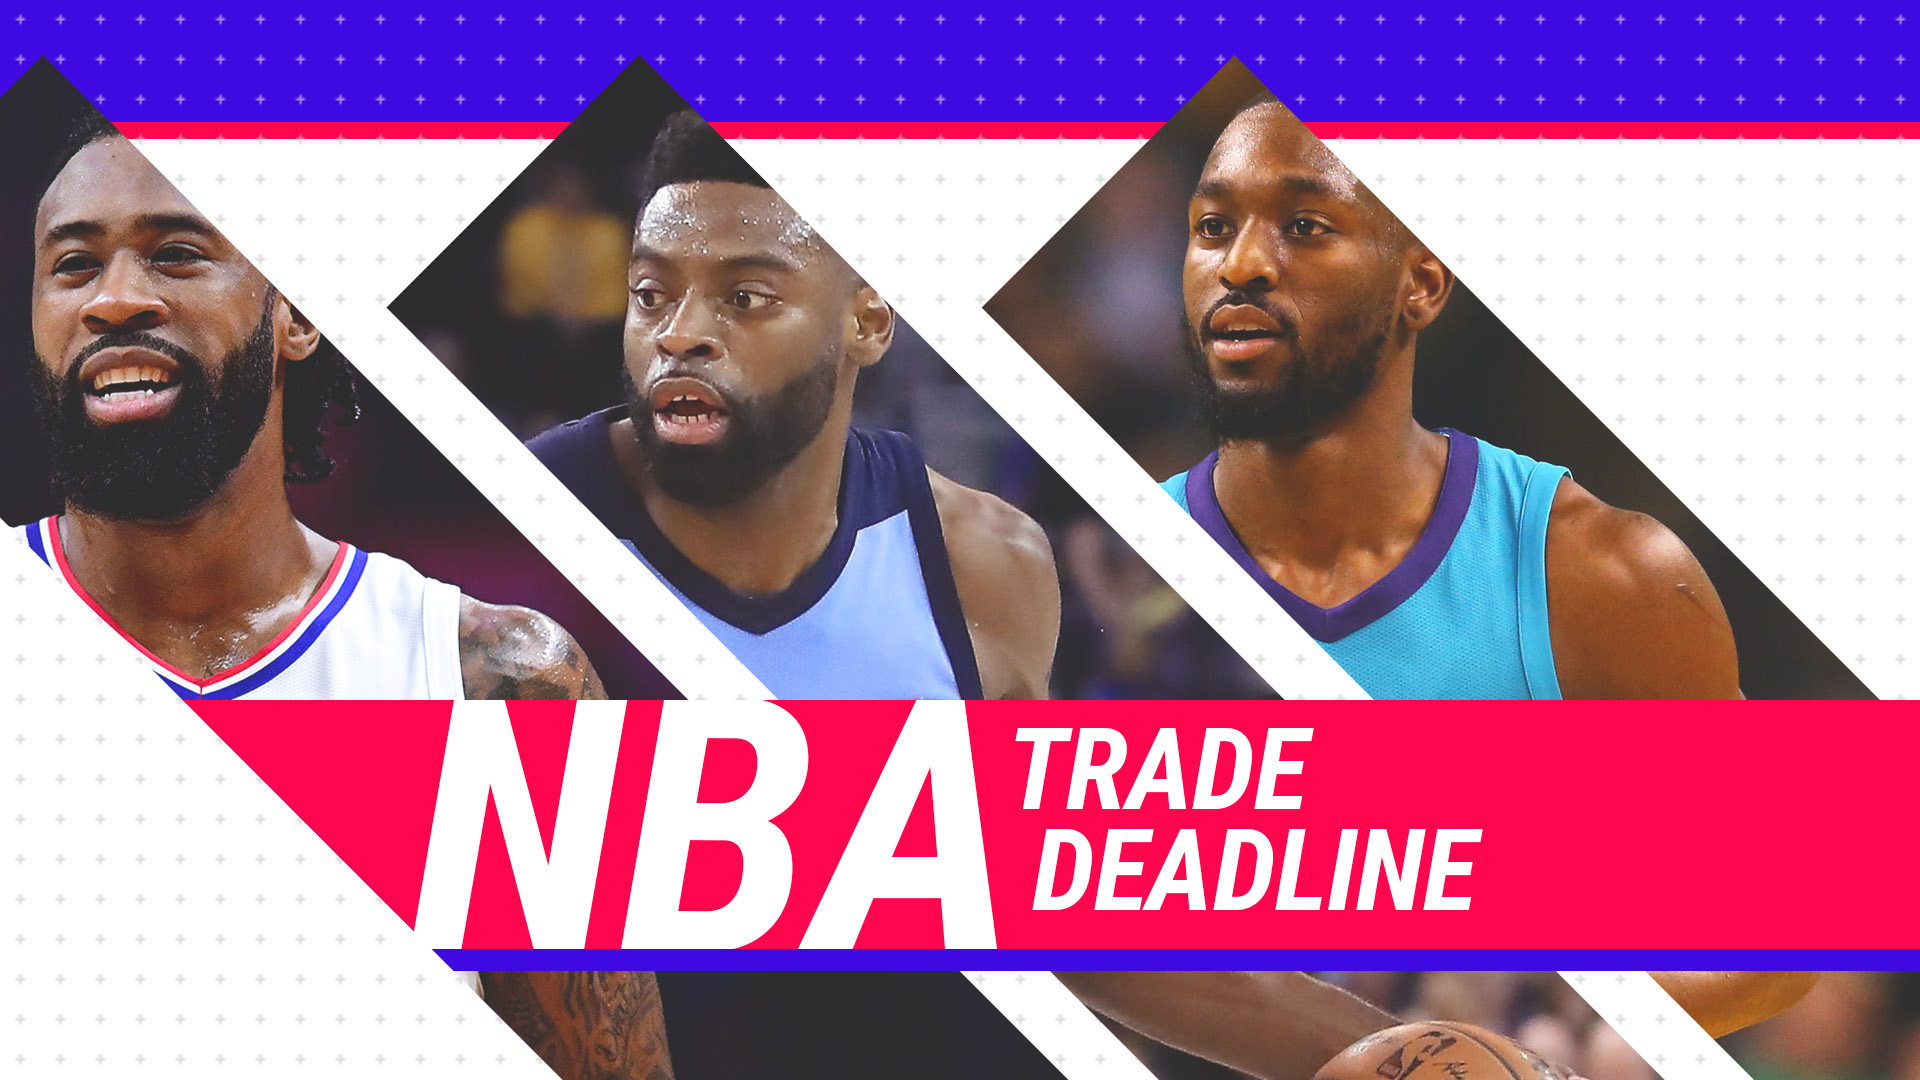 NBA trade rumors: Latest news, updates, buzz on 2018 trade ... Trade Deadline